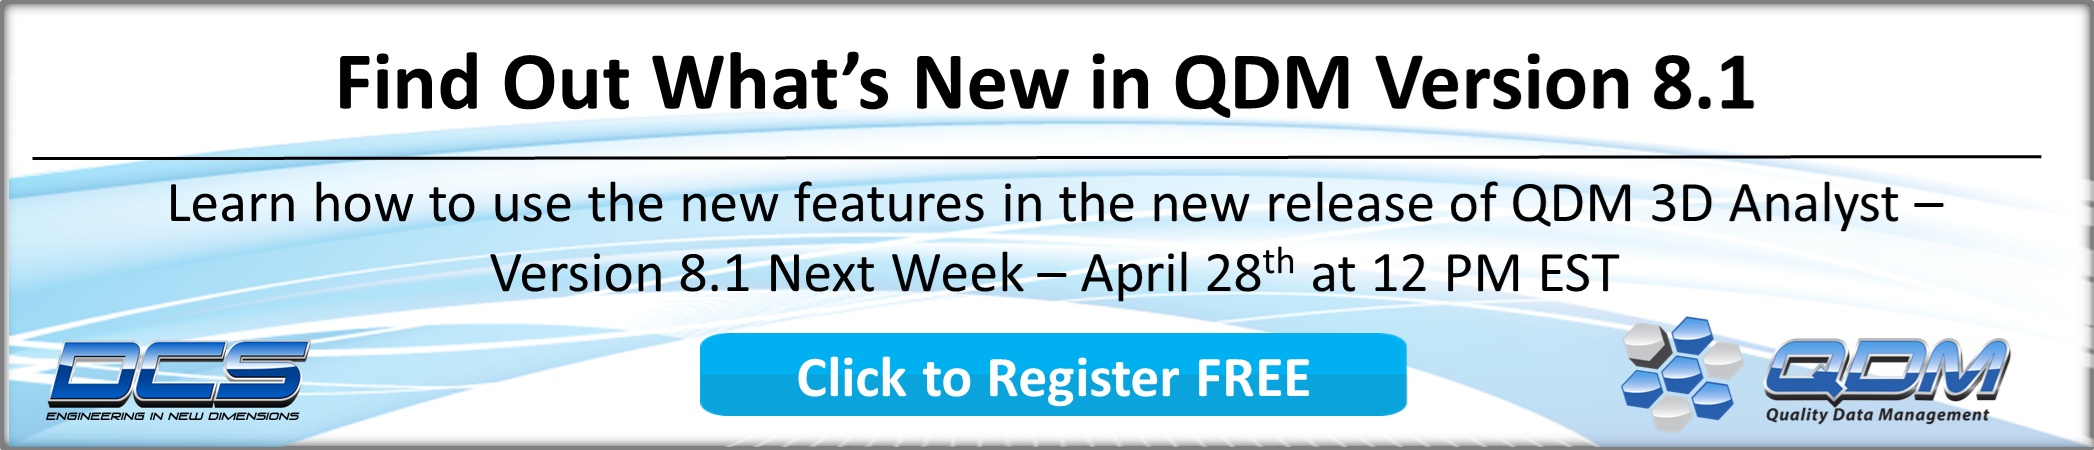 2020 QDM Whats New Webinar